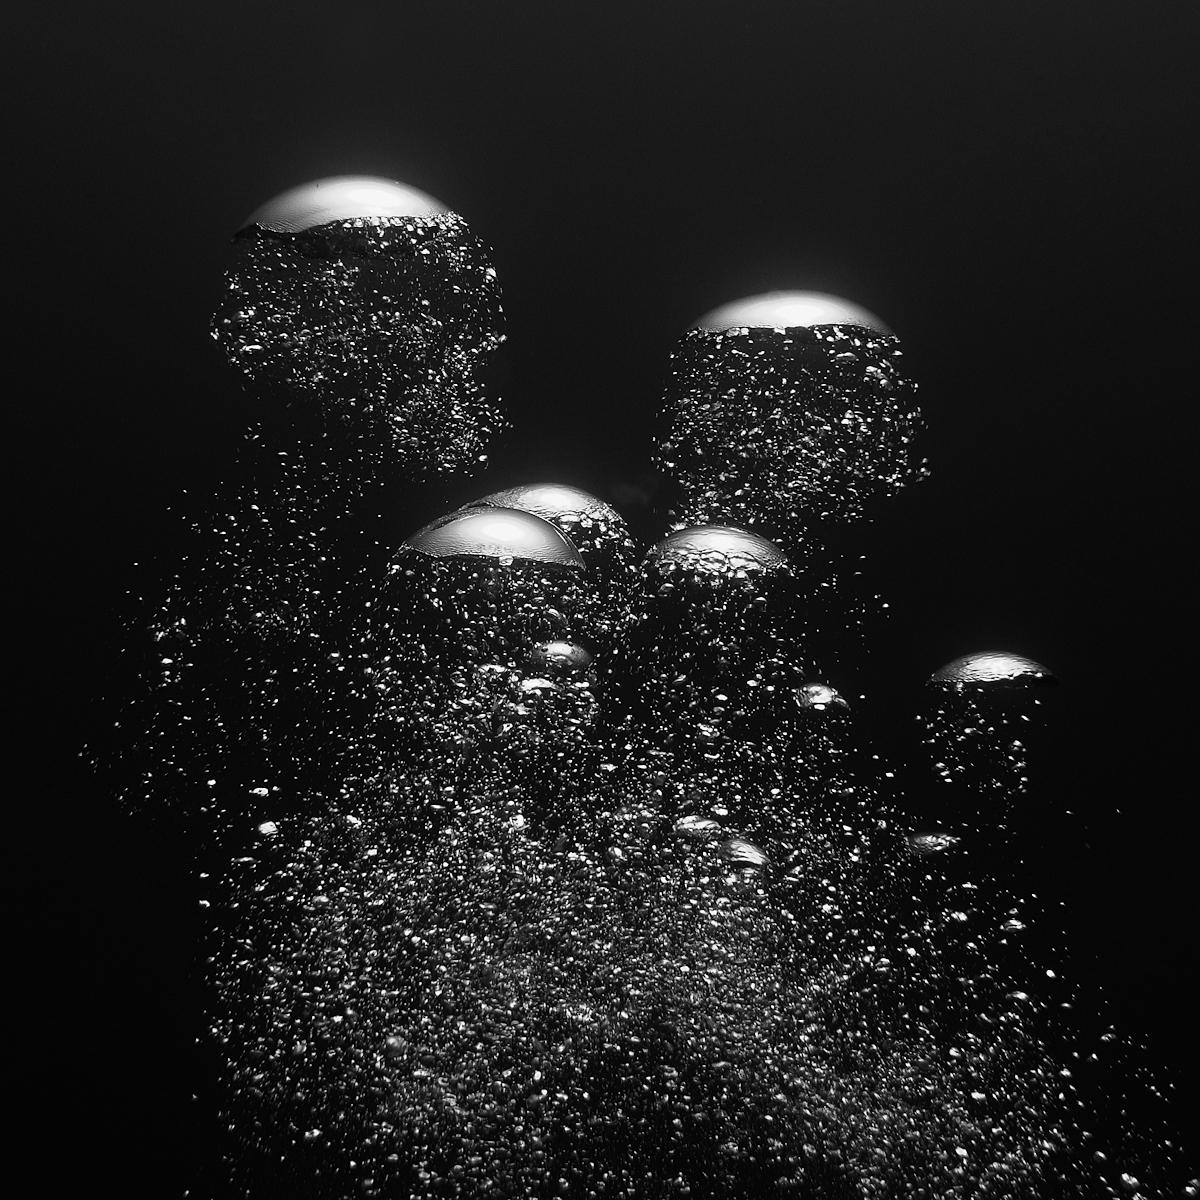 Black Glitter Wallpaper Hengki Koentjoro S Black And White Underwater Photography